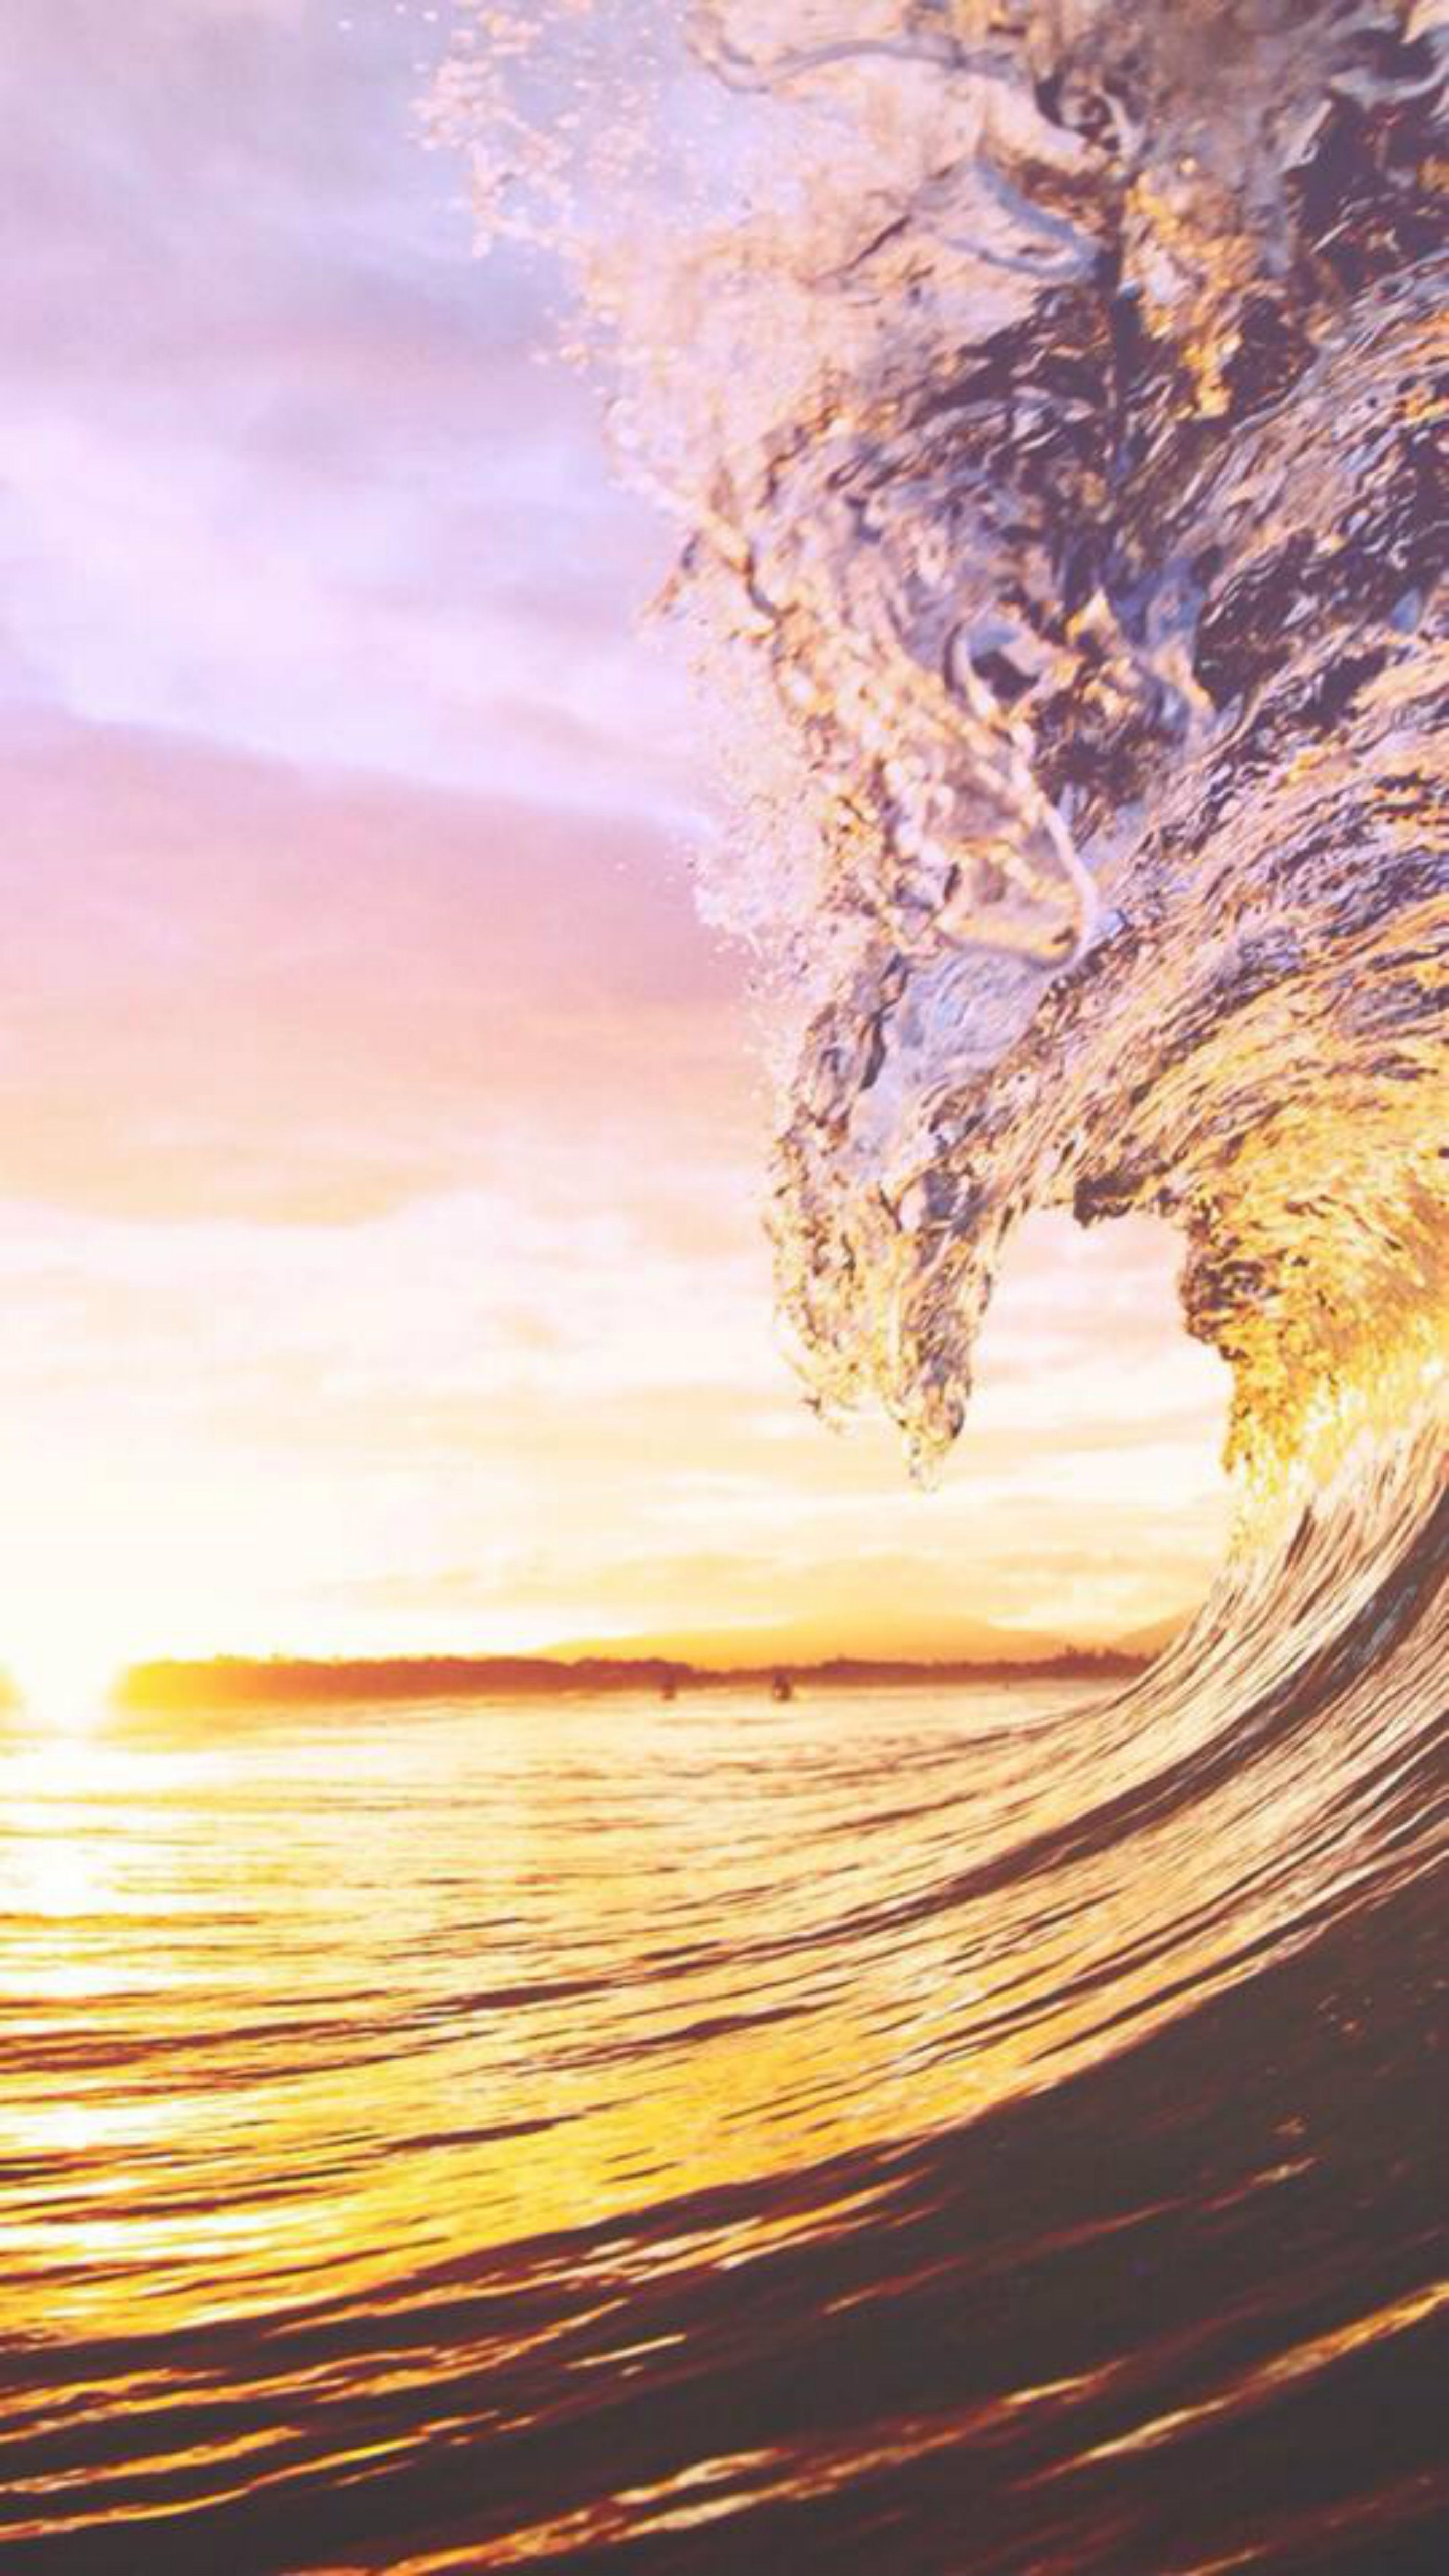 Wallpaper iphone wave - Iphone Wallpaper Summer Waves